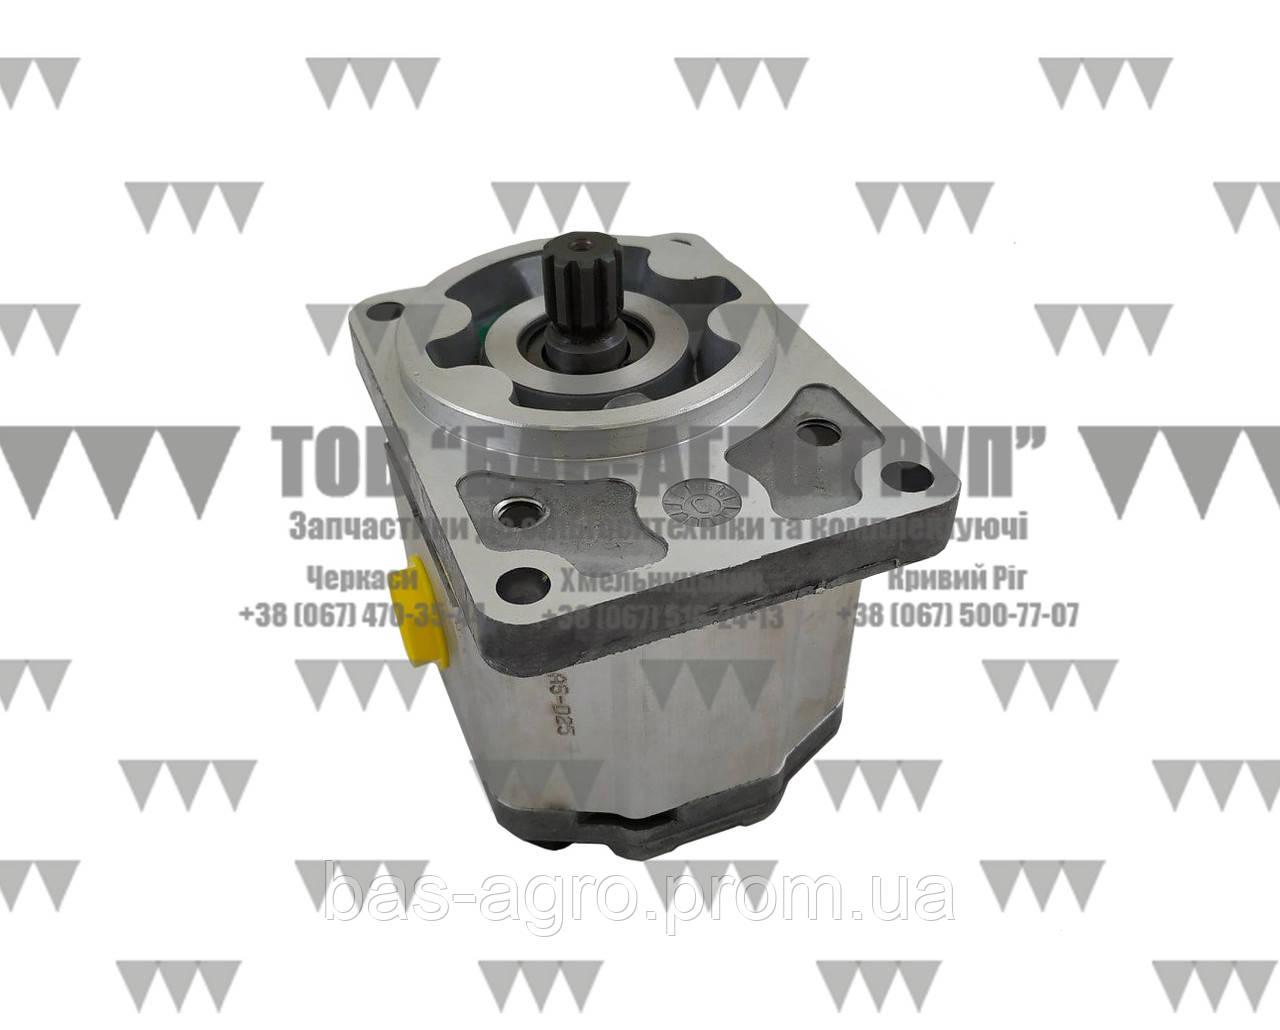 Гидромотор привода вентилятора AC870920 Kverneland оригинал